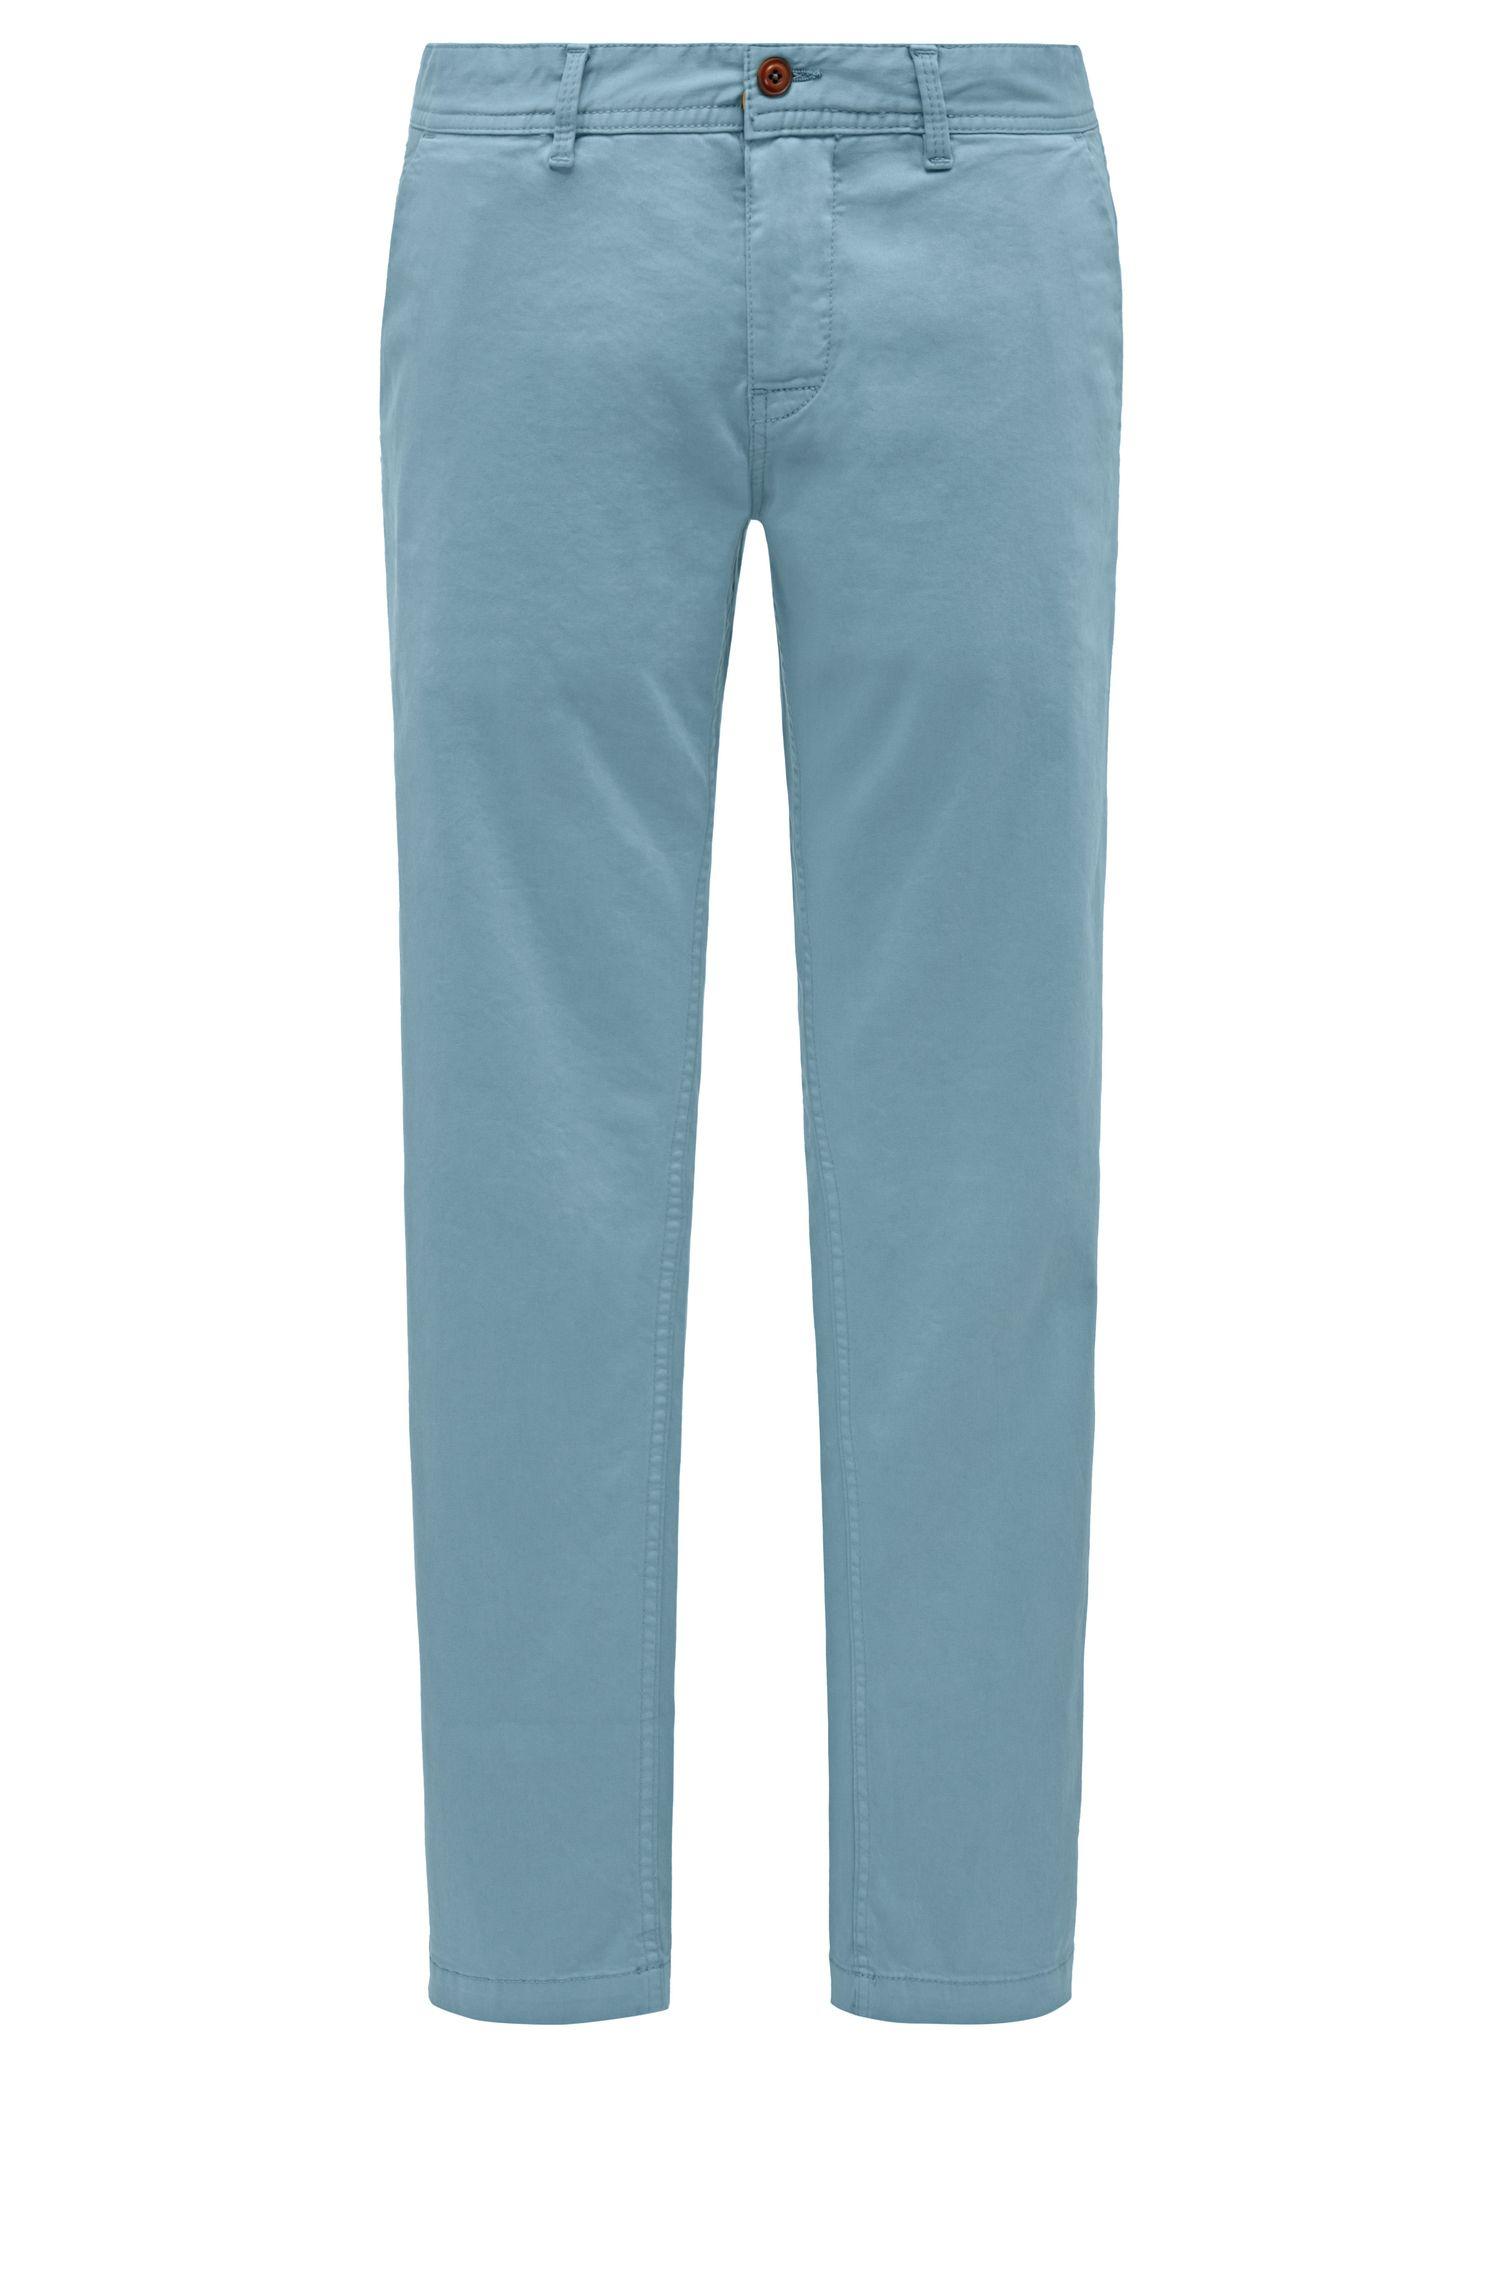 Stretch Cotton Chino Pants, Slim Fit | Schino Slim D